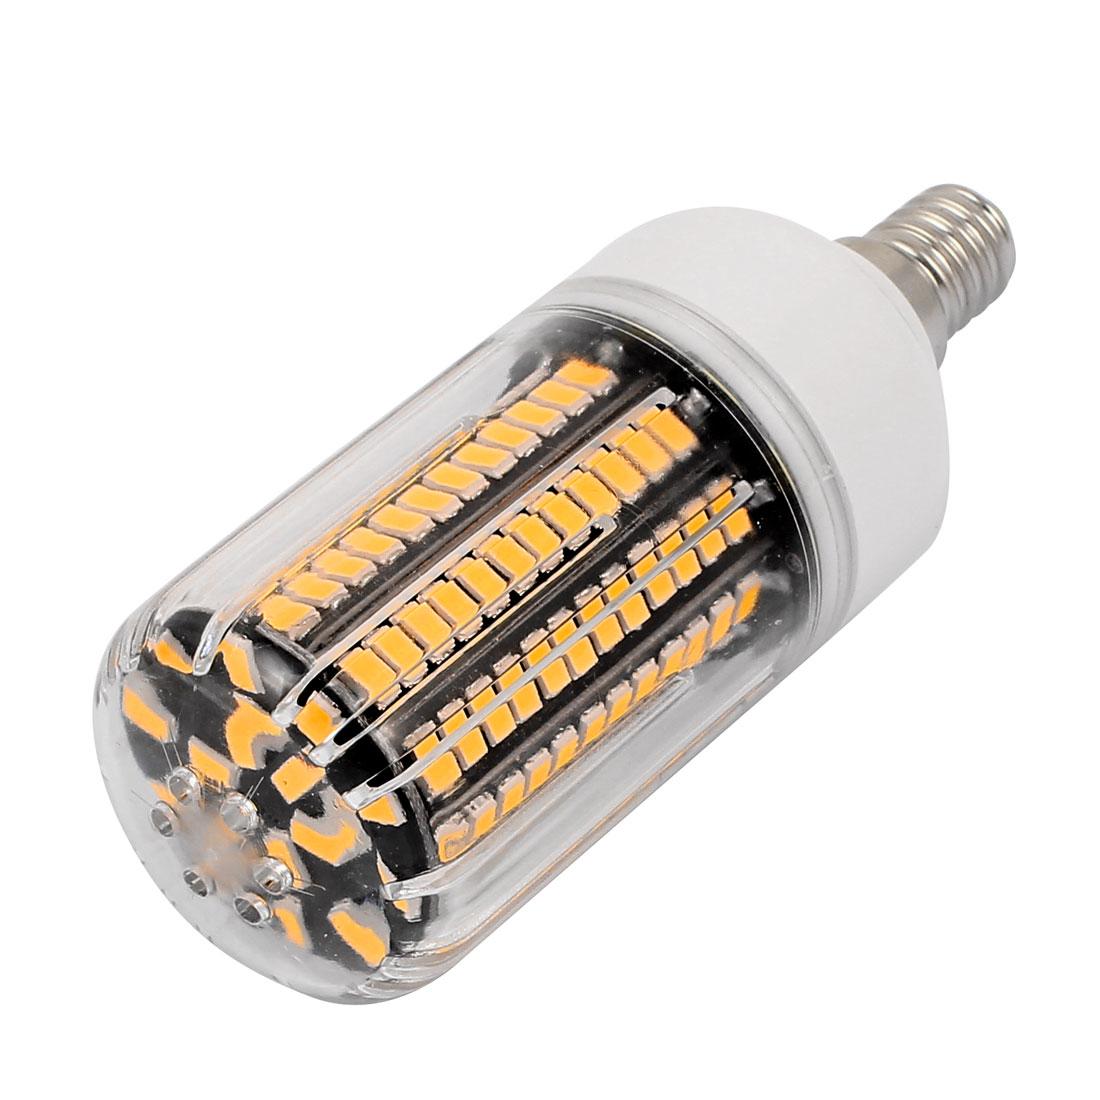 AC 220V Super Bright E14 15W 136 x 5733SMD Energy Saving Corn Bulb Lamp Warm White